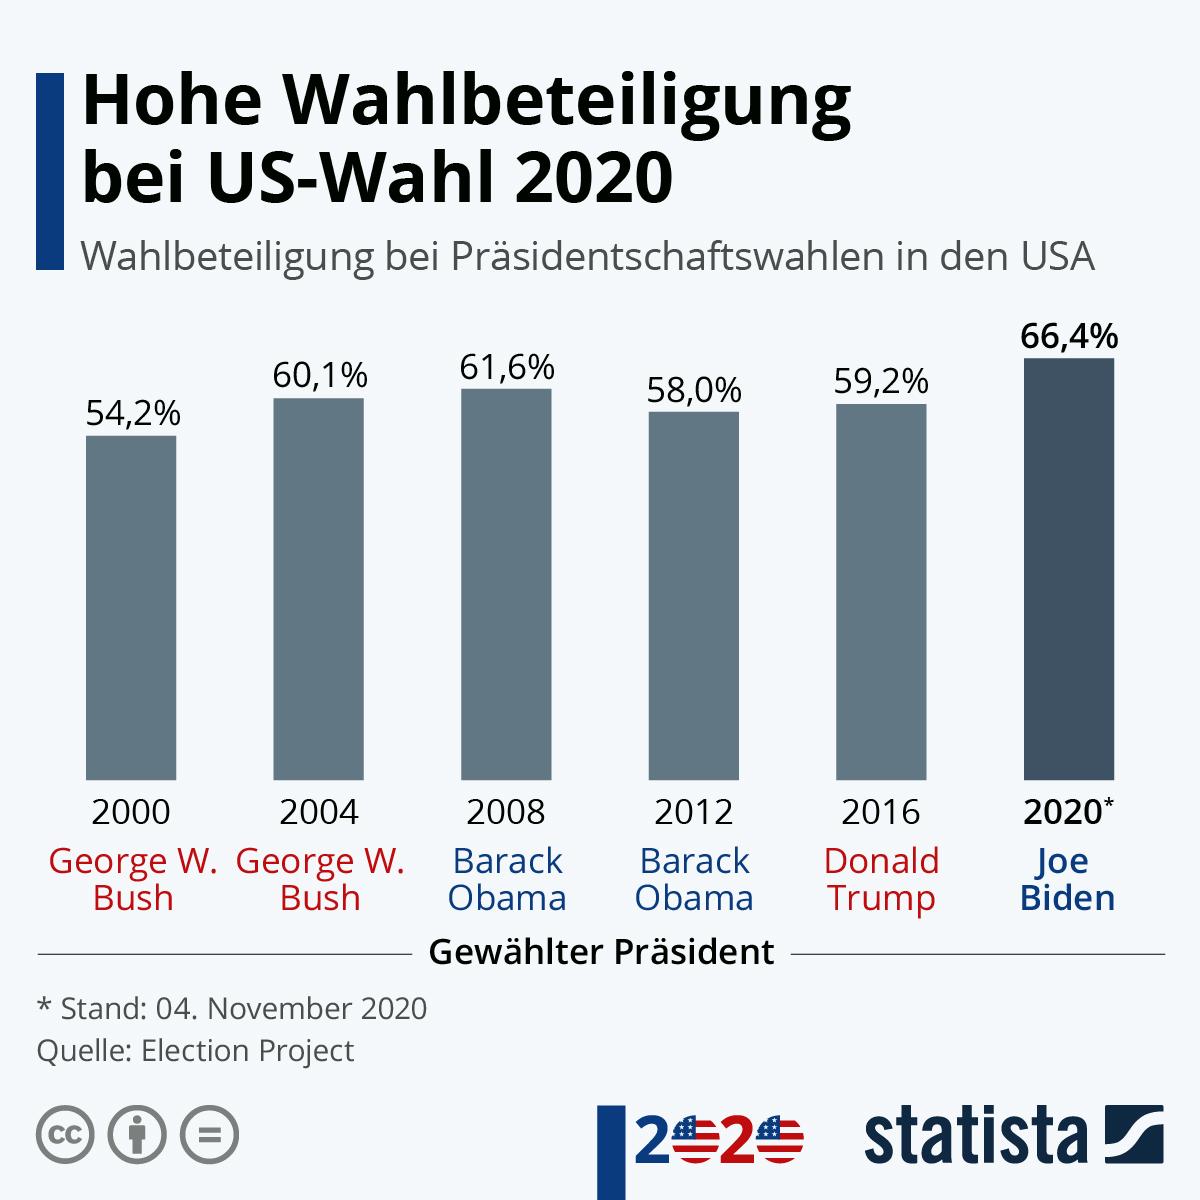 Infografik: Hohe Wahlbeteiligung bei US-Wahl 2020 | Statista